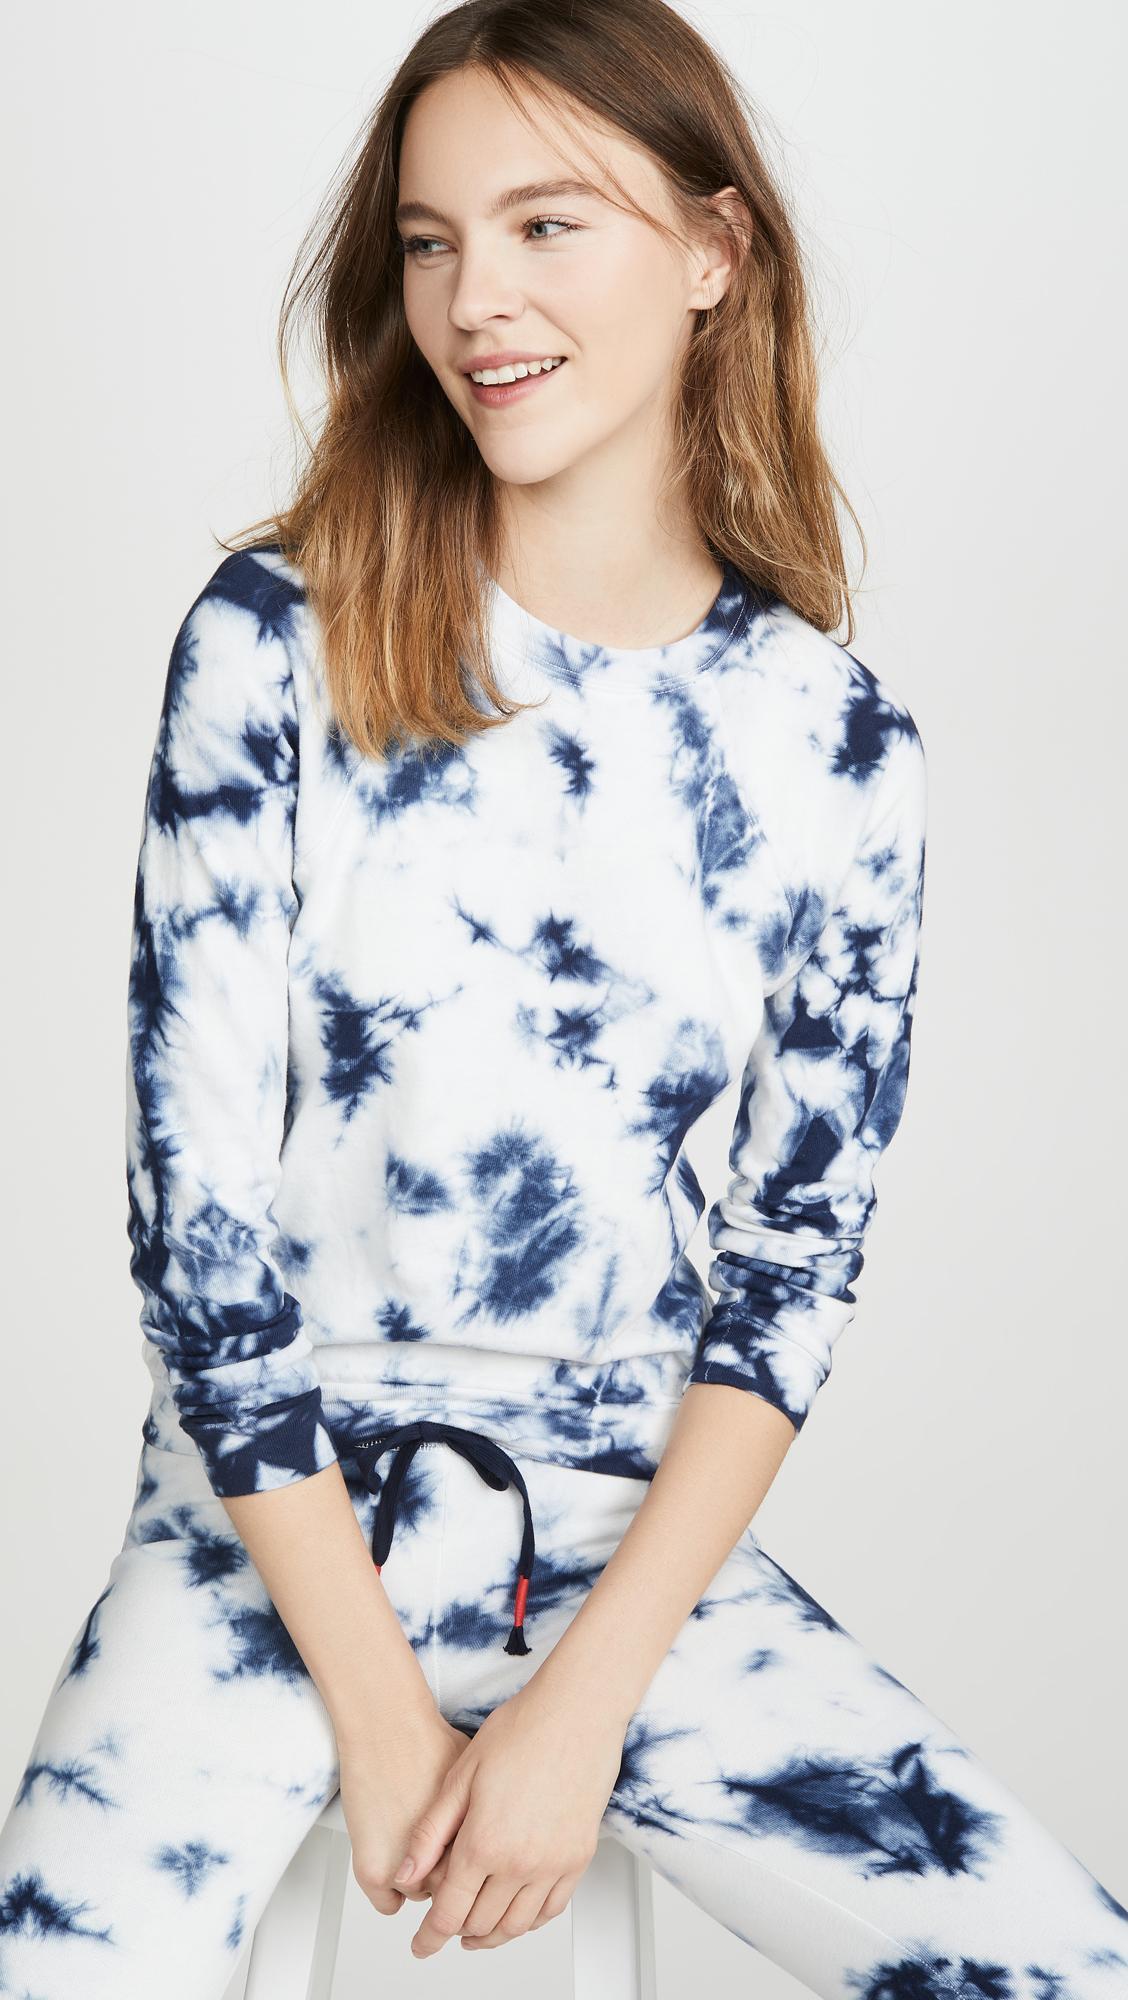 Nina Dobrev's Tie-Dye Matching Set Is Absolutely My Next Purchase 18